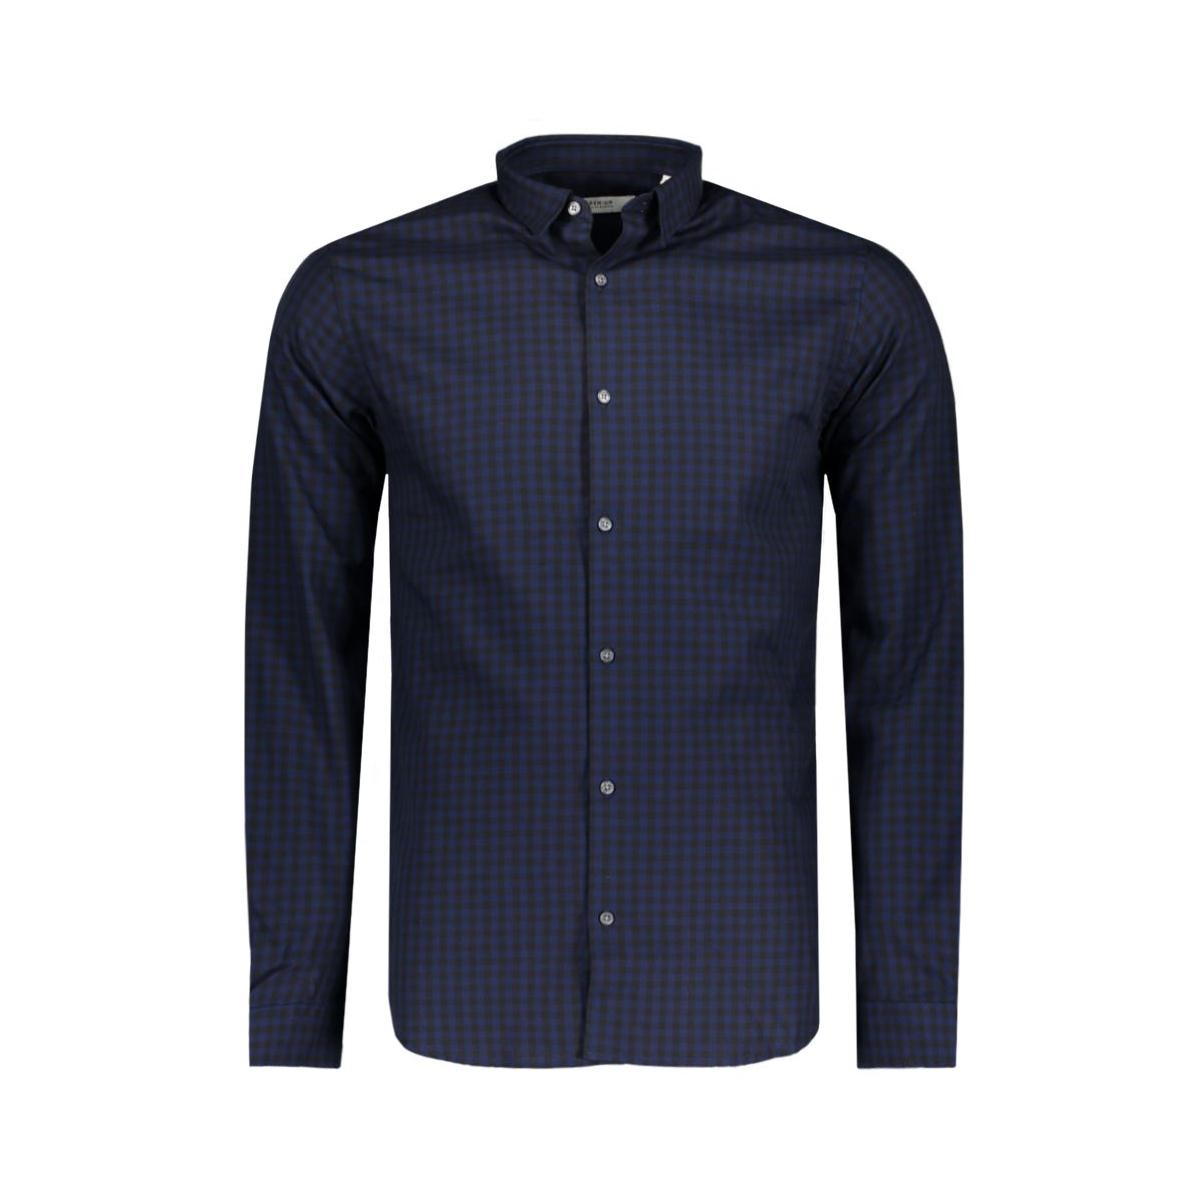 jprbrad shirt l/s noos 12116632 jack & jones overhemd navy blazer/check